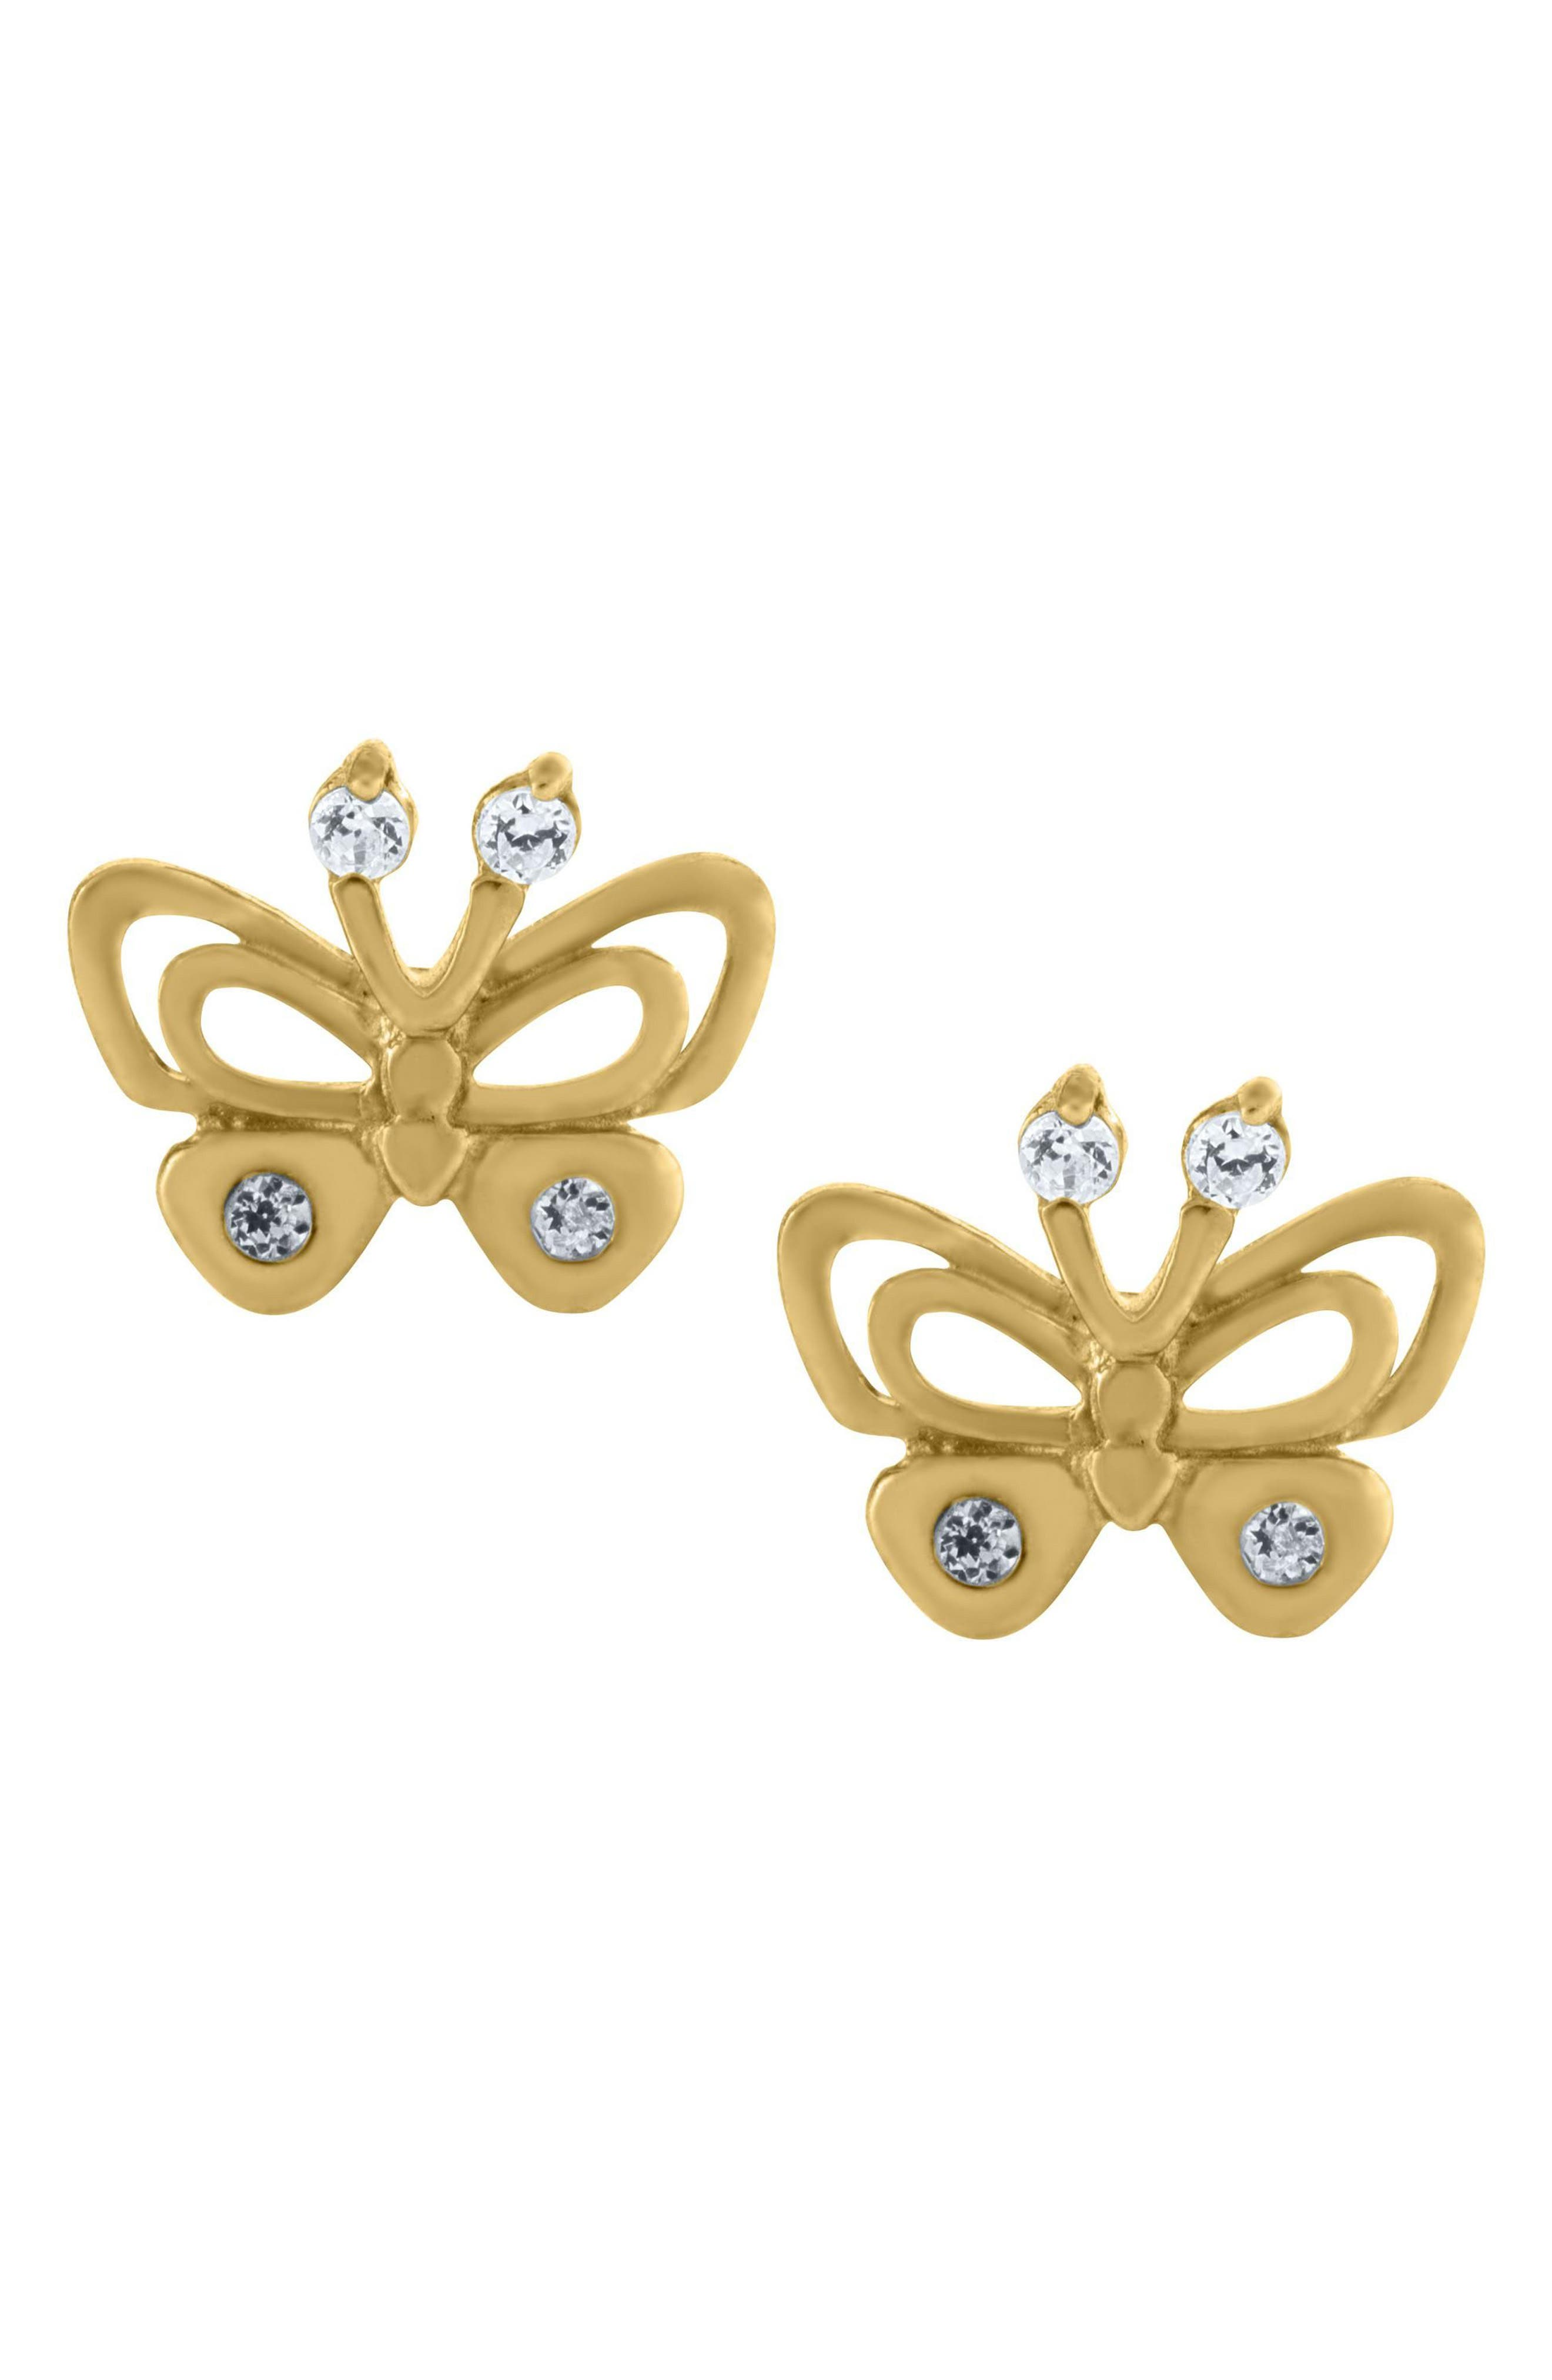 14k Gold Butterfly Earrings,                             Alternate thumbnail 2, color,                             GOLD